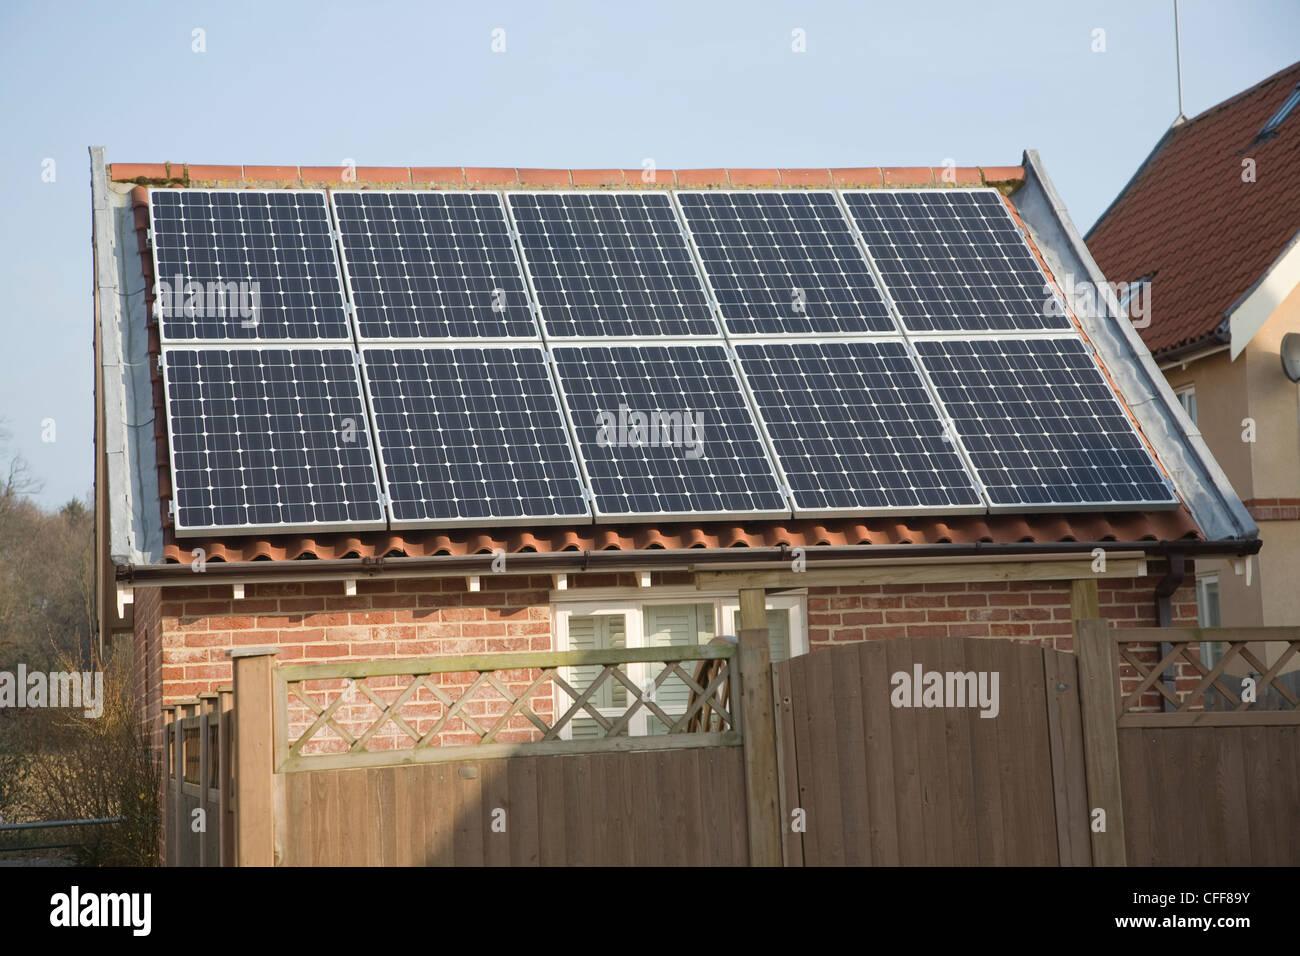 Domestic solar panel array on garage roof - Stock Image